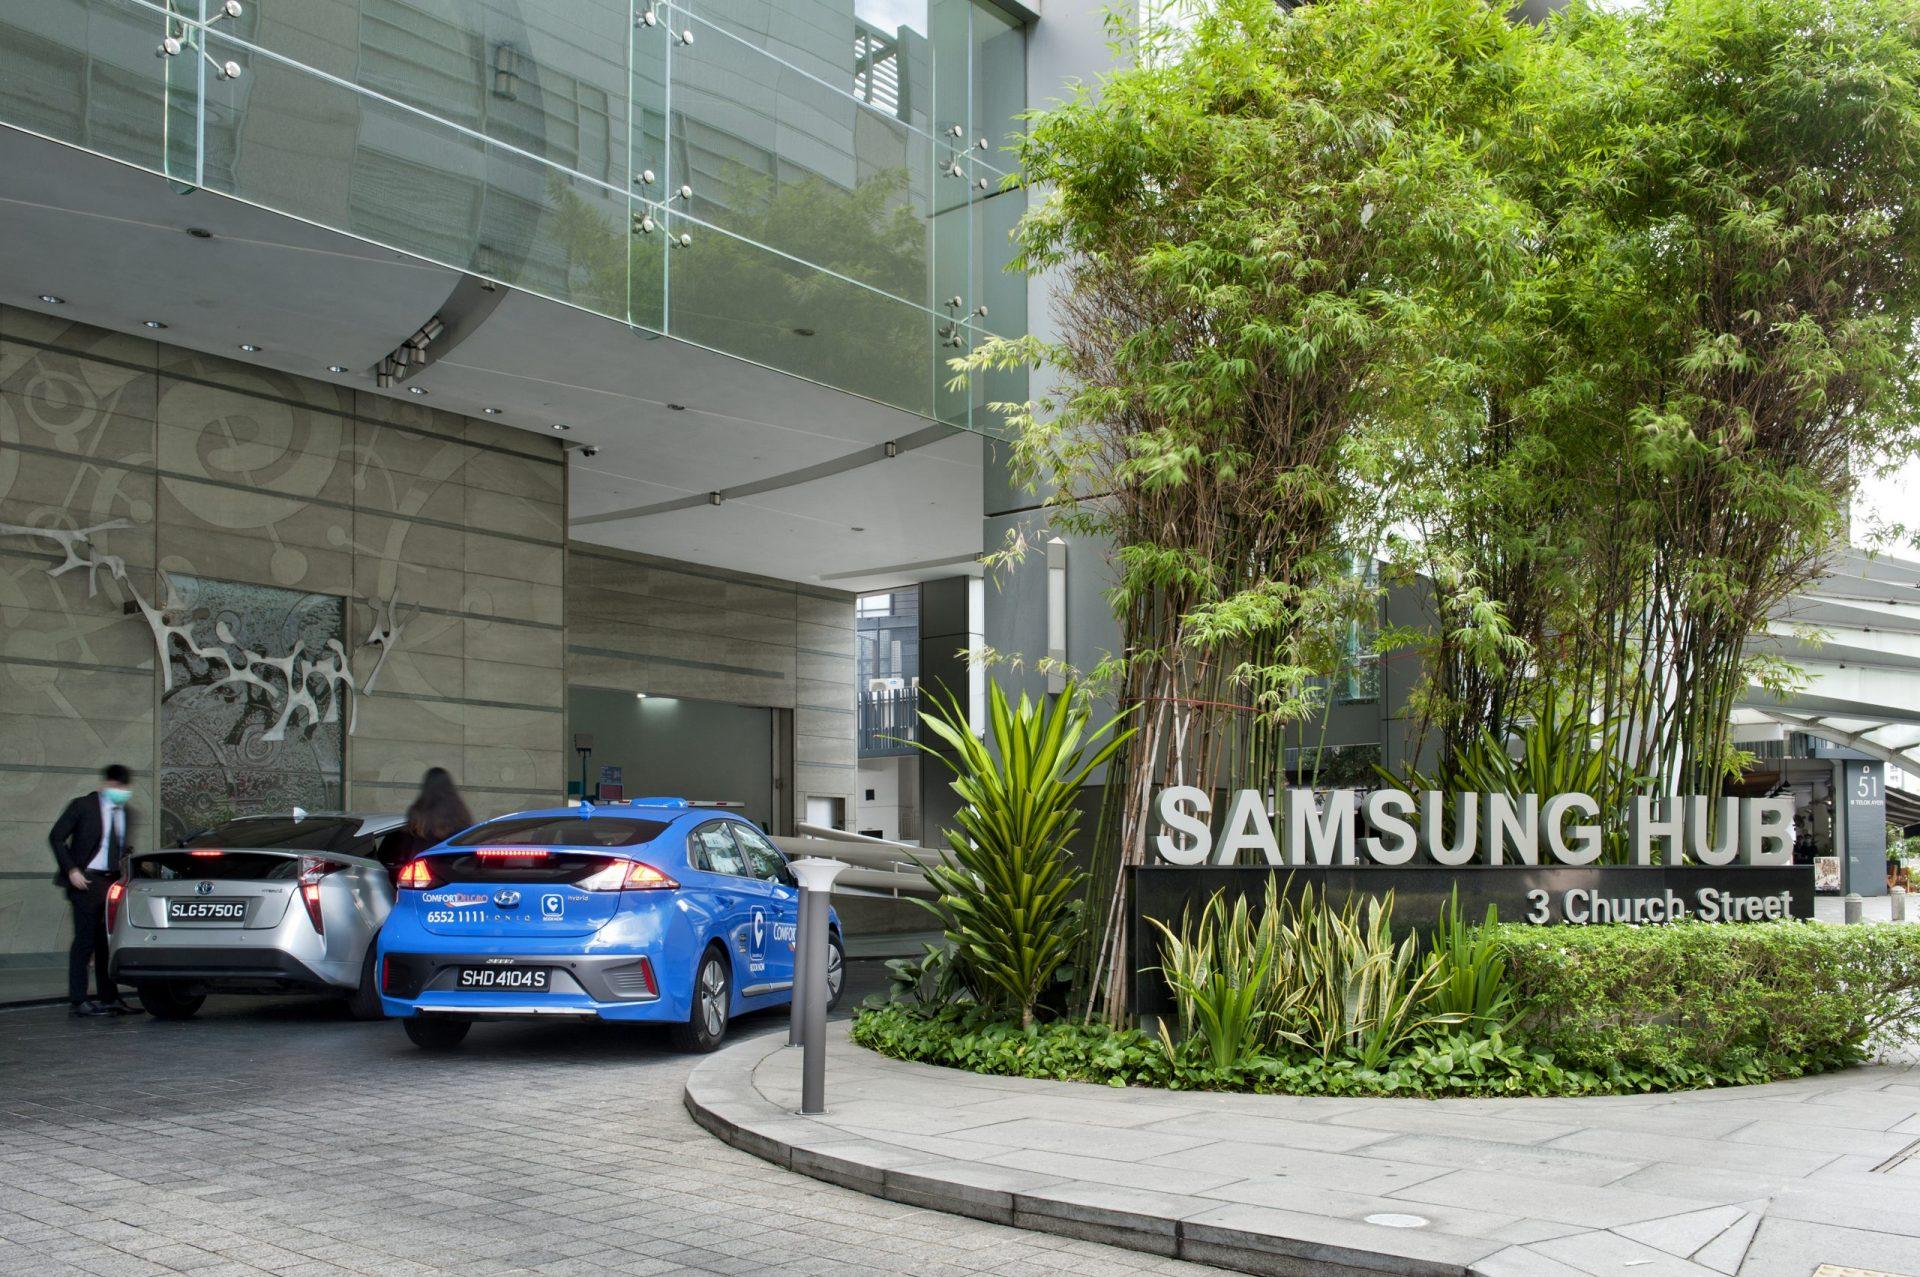 Sun Venture - Samsung Hub Drop-off Point